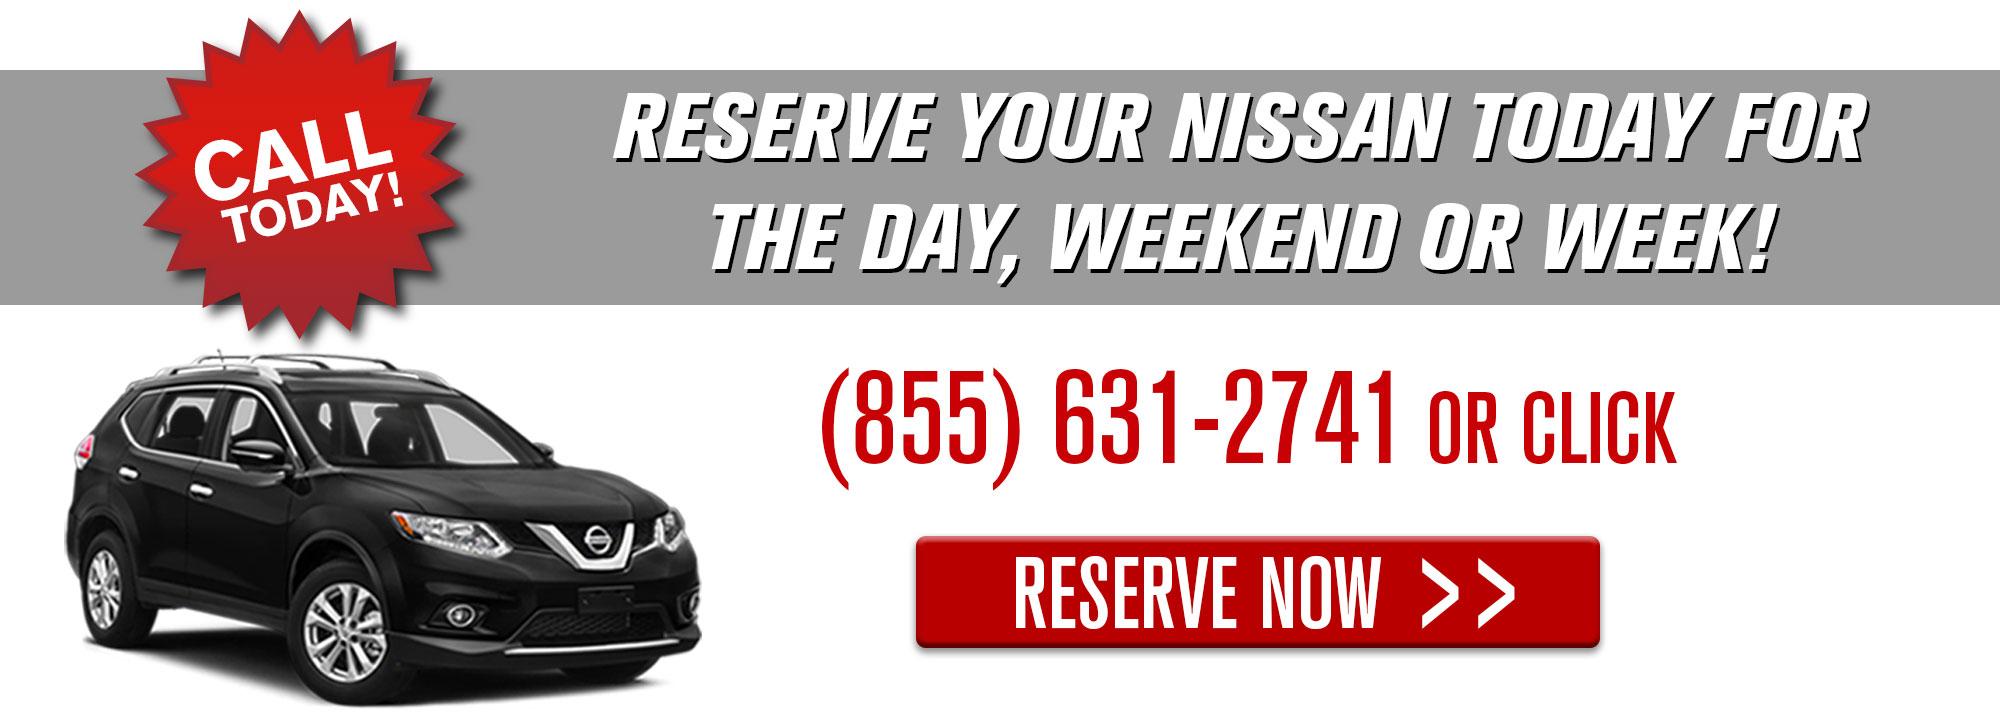 Book Rental Car Baton Rouge LA | Denham Springs | Prairieville